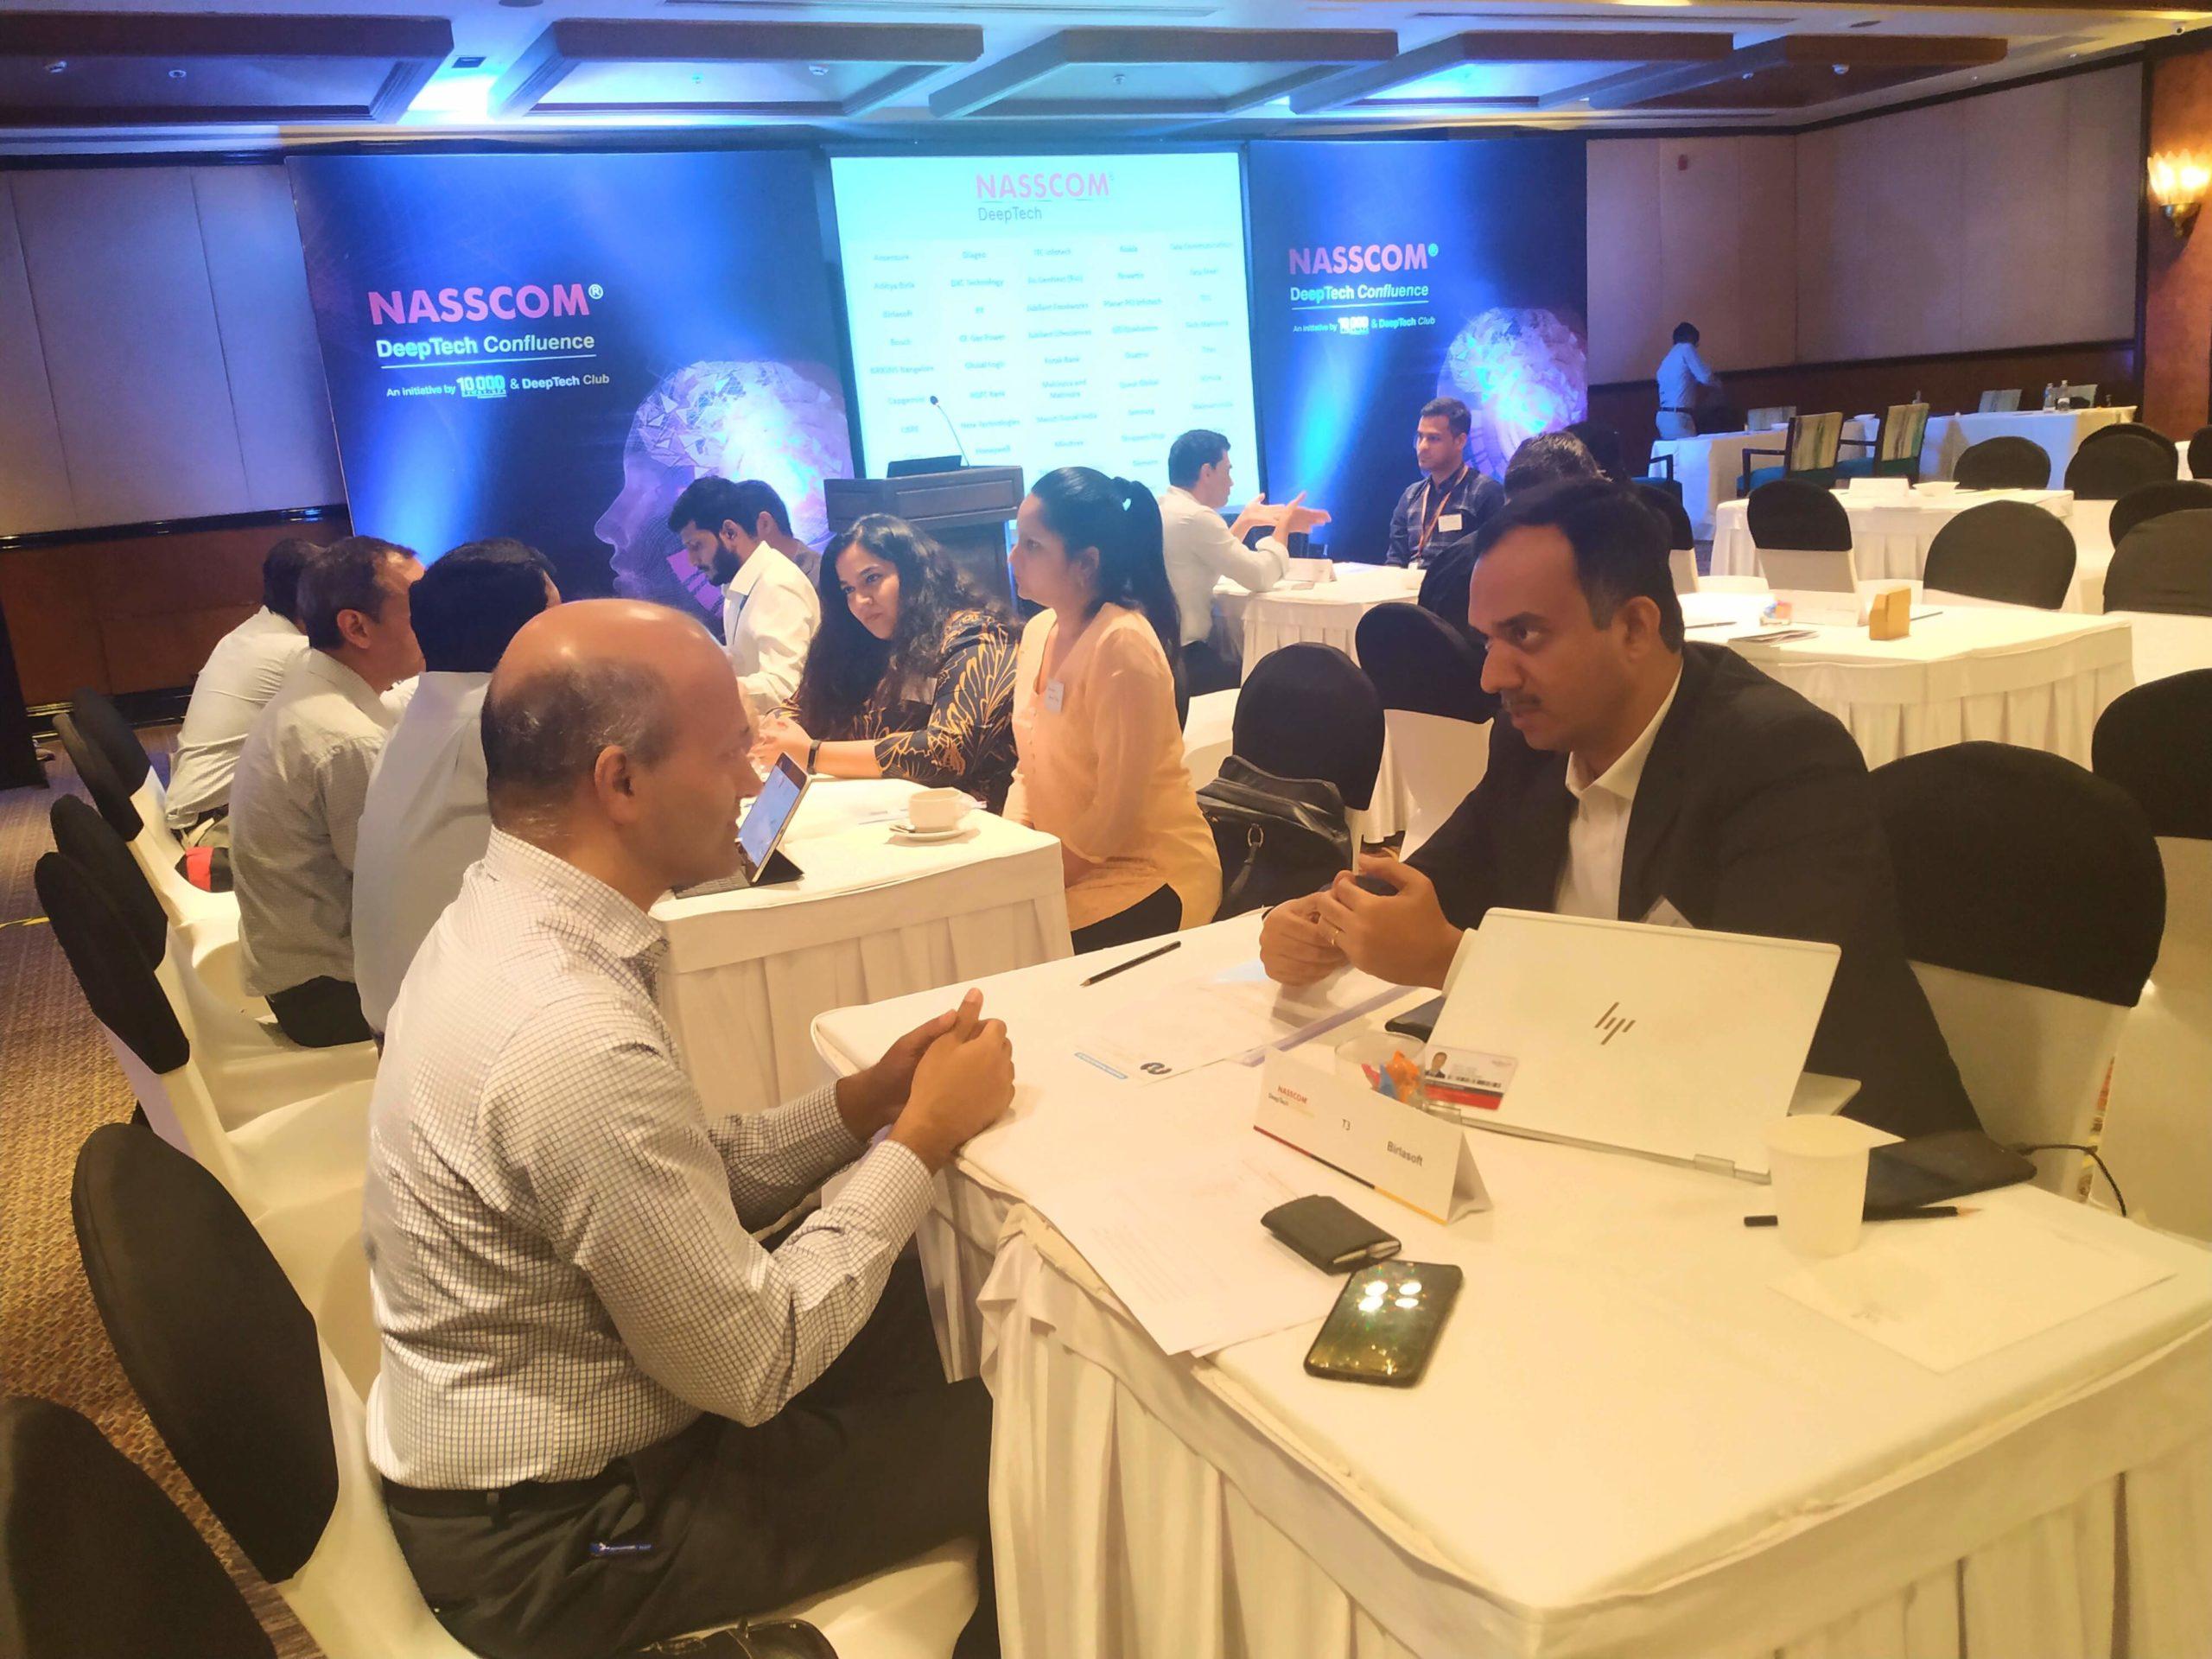 Nasscom Startups India